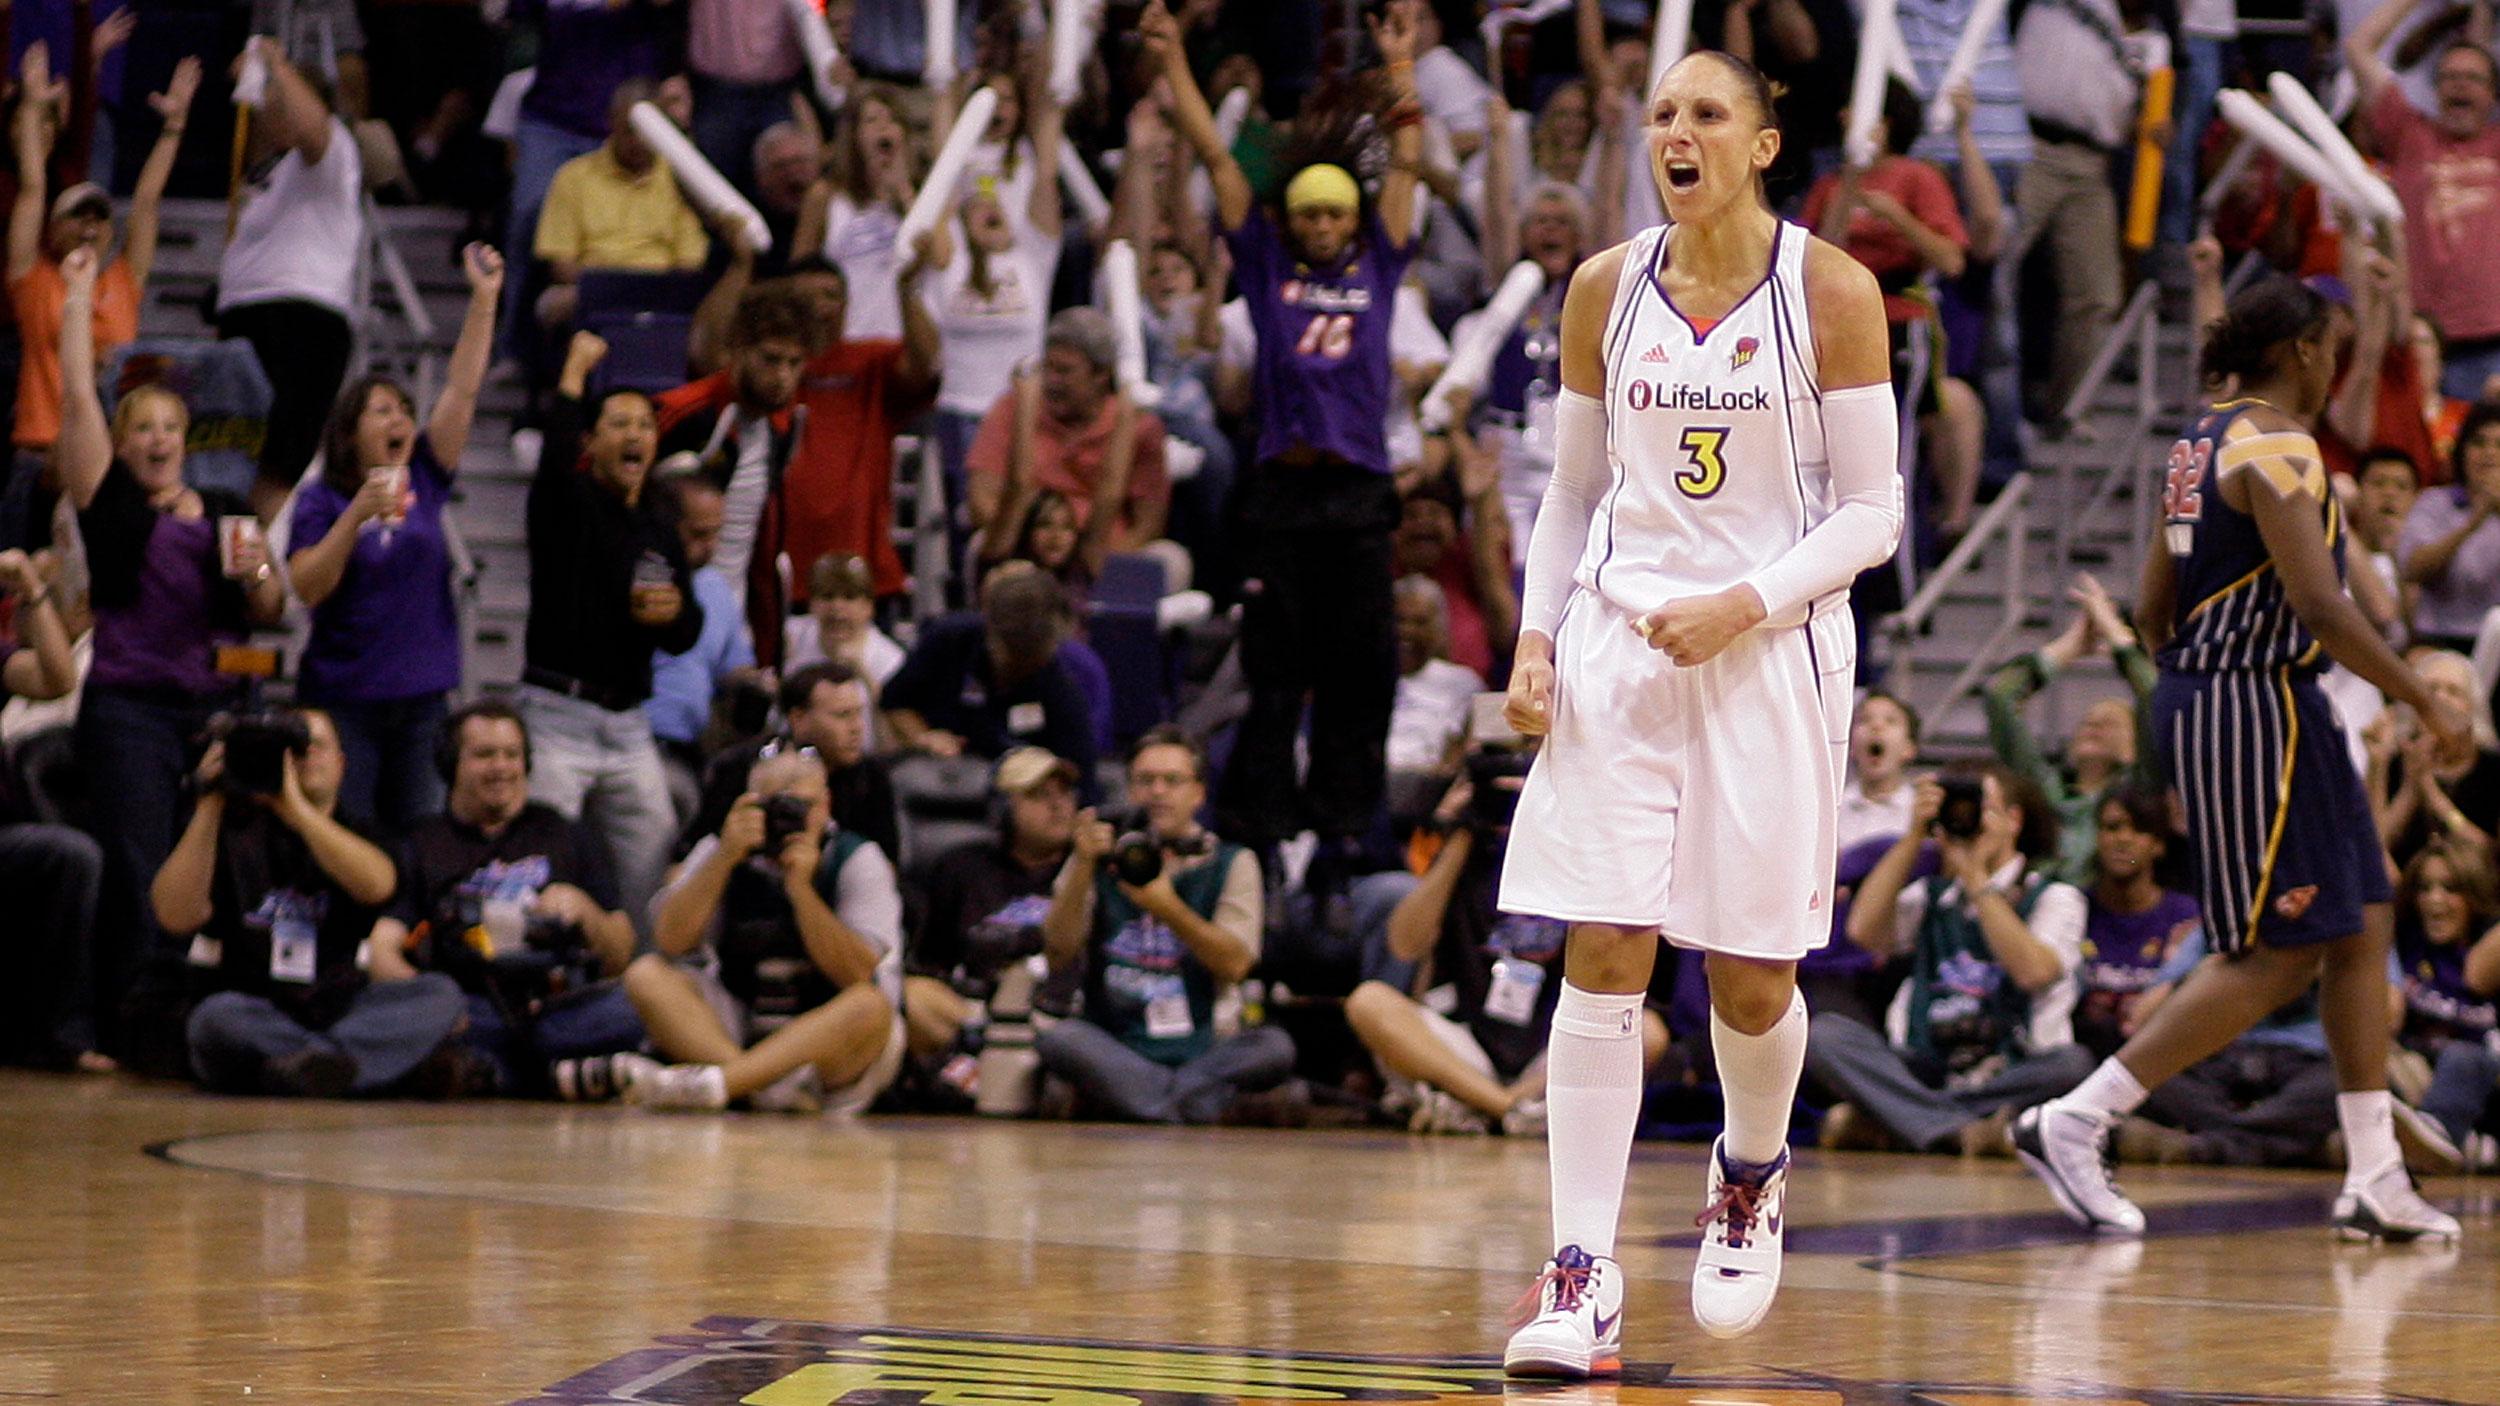 Diana Taurasi, Olympic champion, WNBA MVP